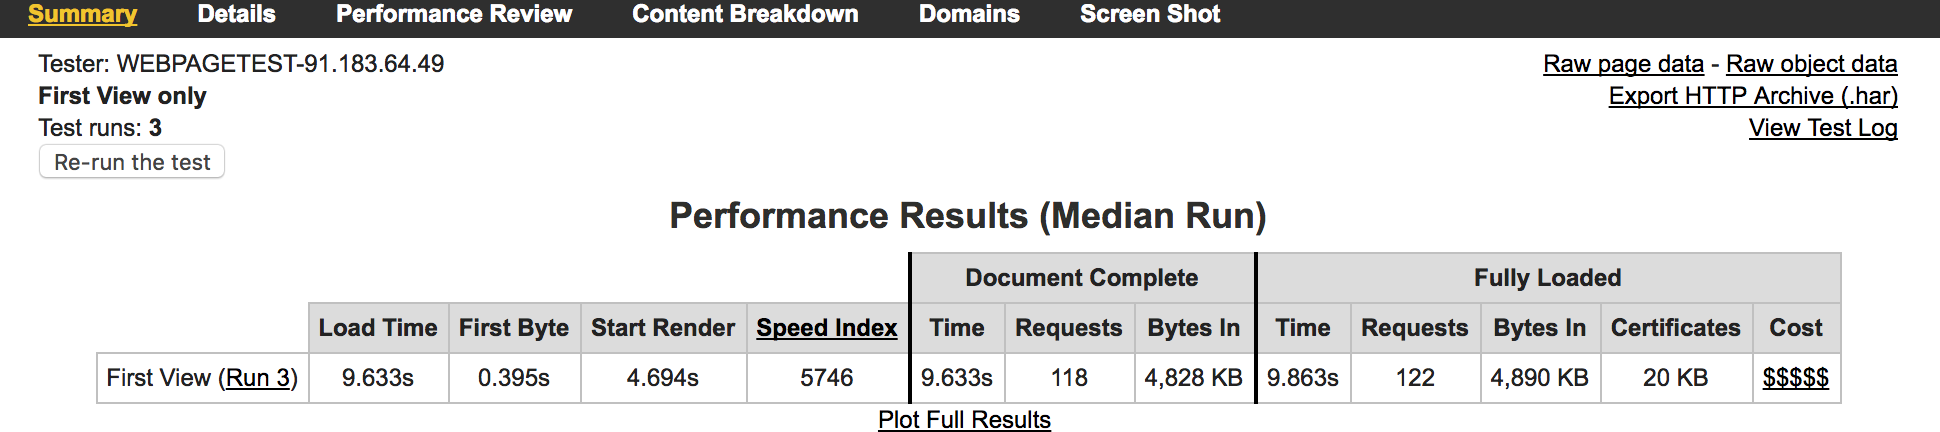 webpagetest-performance-summary